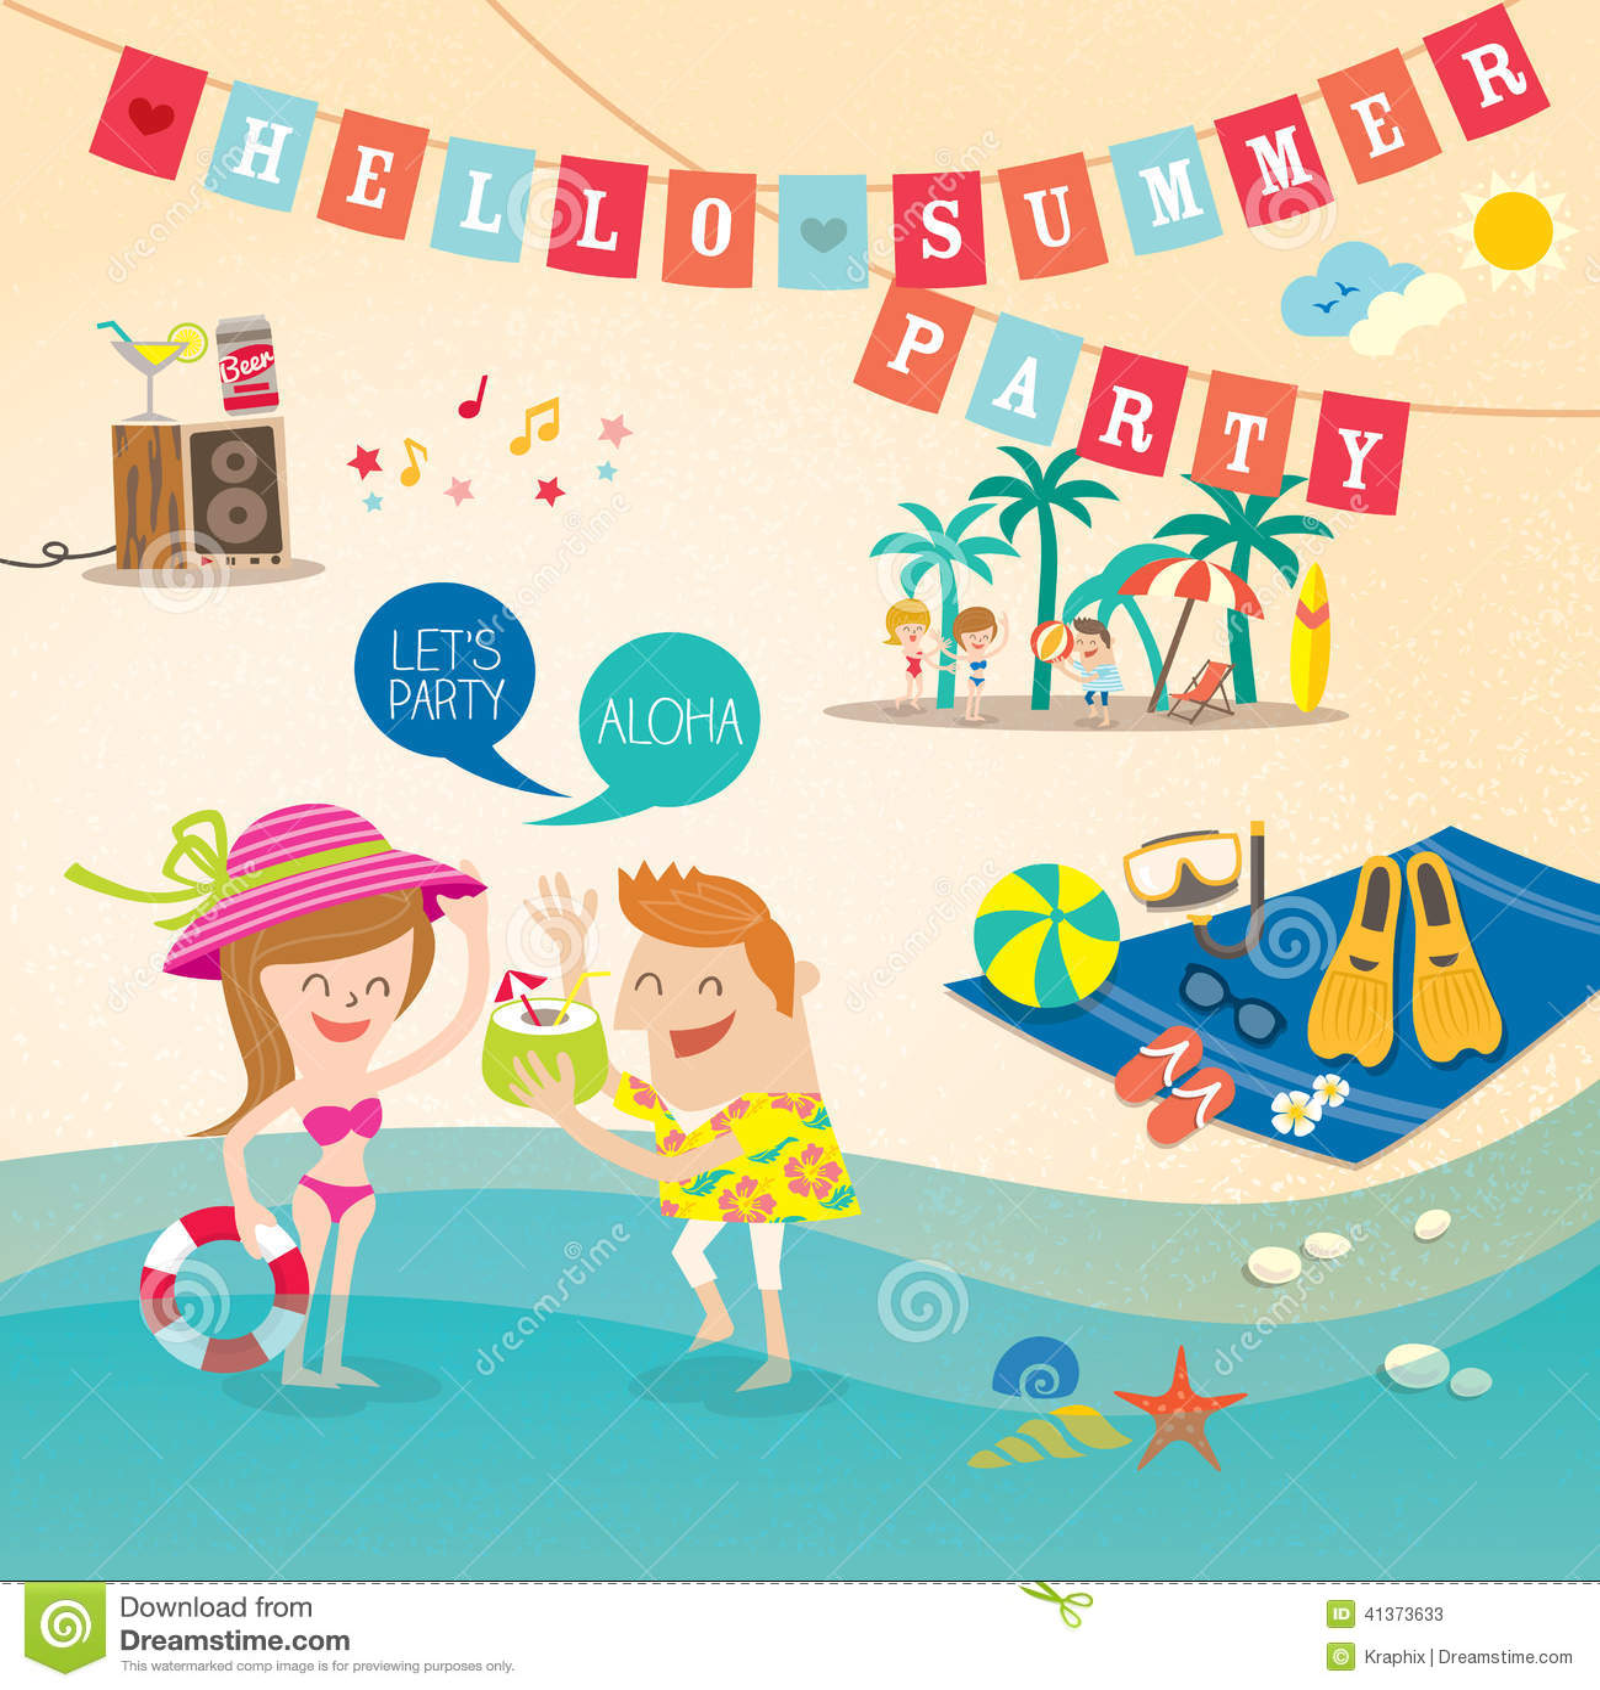 ... Holiday Cartoon Background Clip Art Stock Vector - Image: 41373633